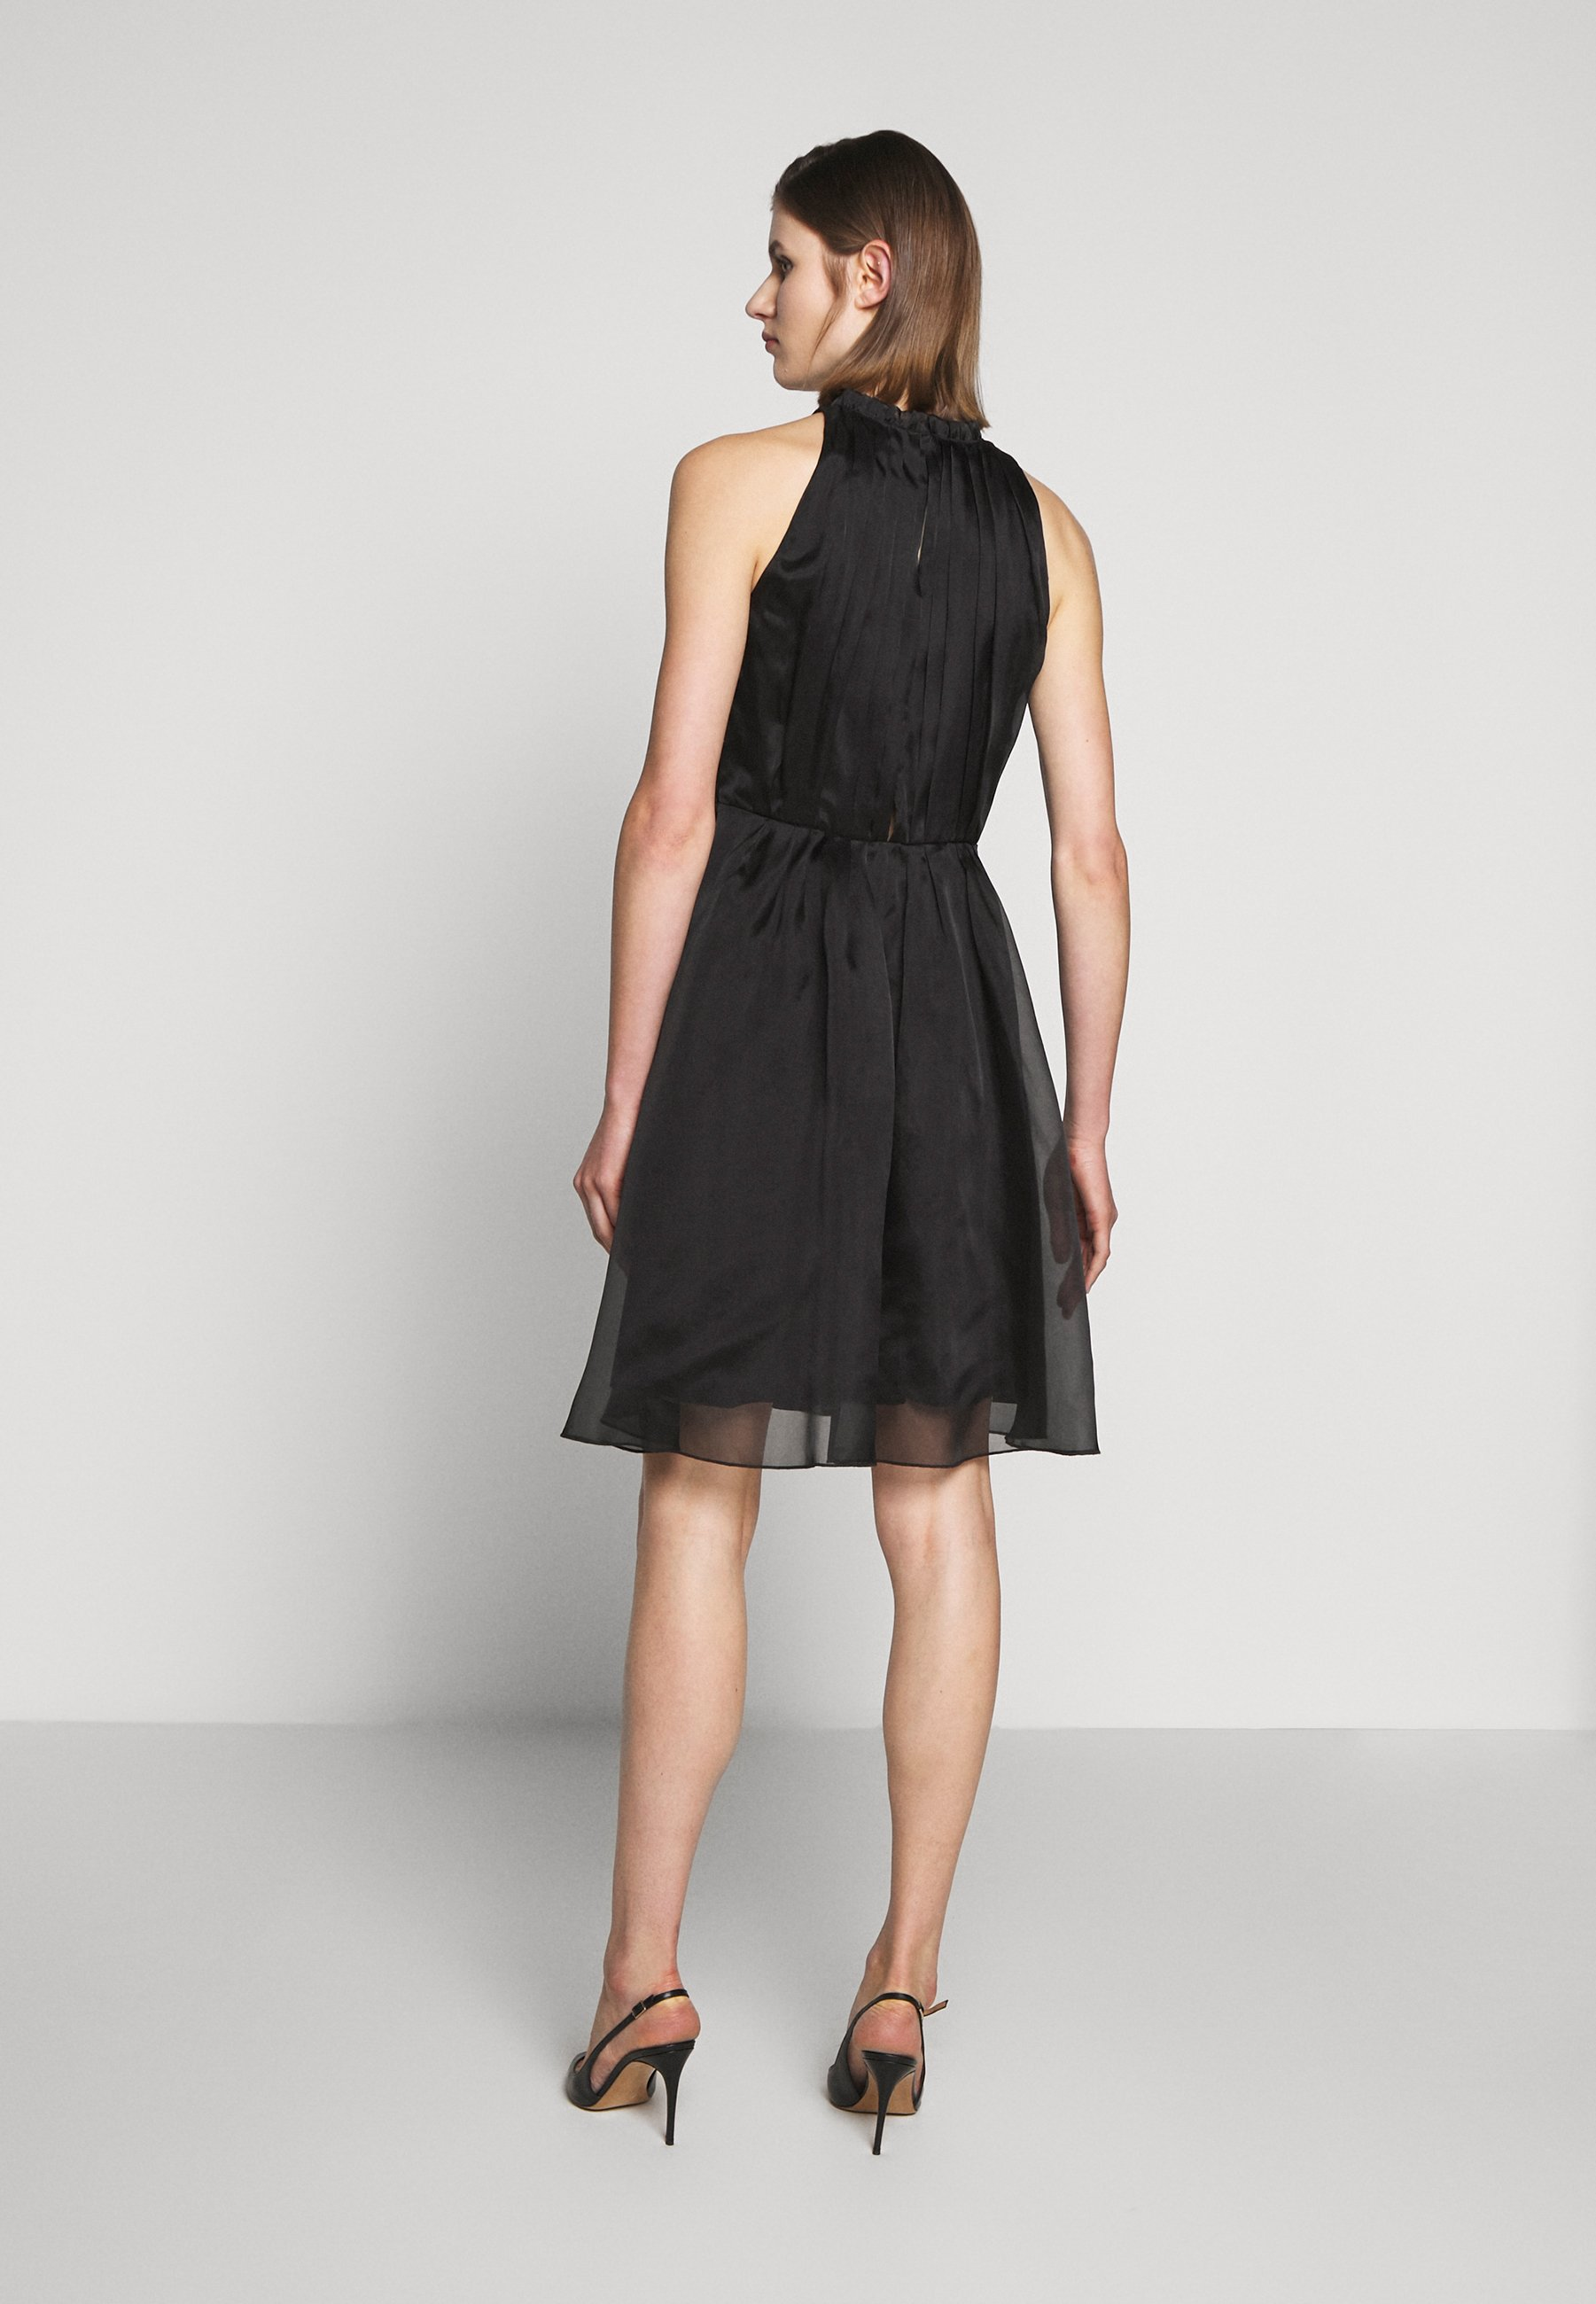 Najwyżej oceniane Duża obniżka Marella LIPARI - Sukienka koktajlowa - black | Odzież damska 2020 lY3v8